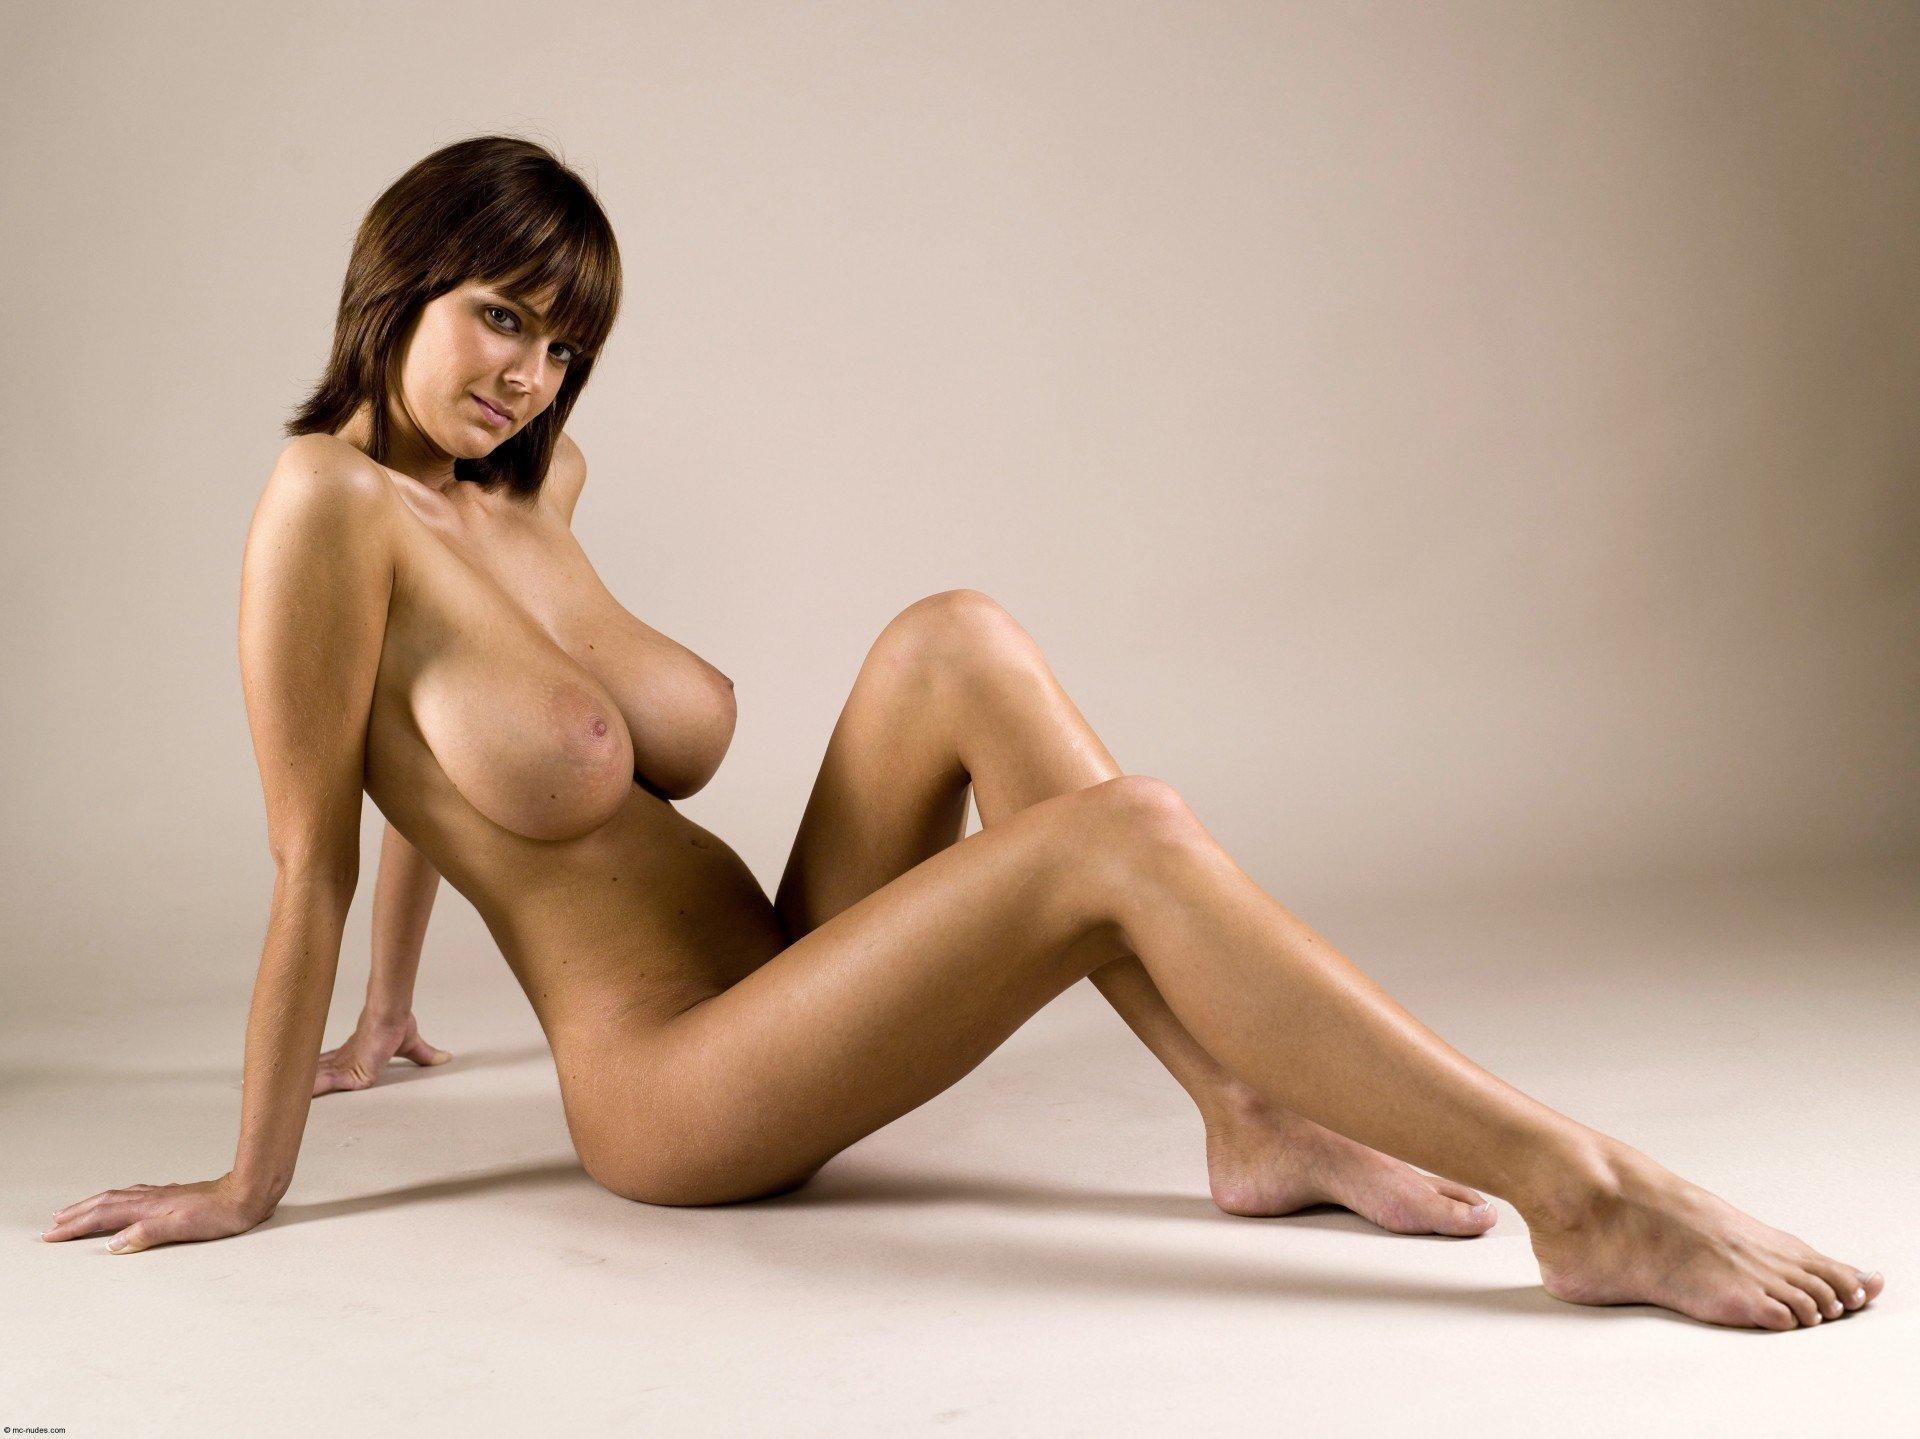 gabrielle-breasts-tits-nipples-breast-big-tits-nude-sexy-hot-women